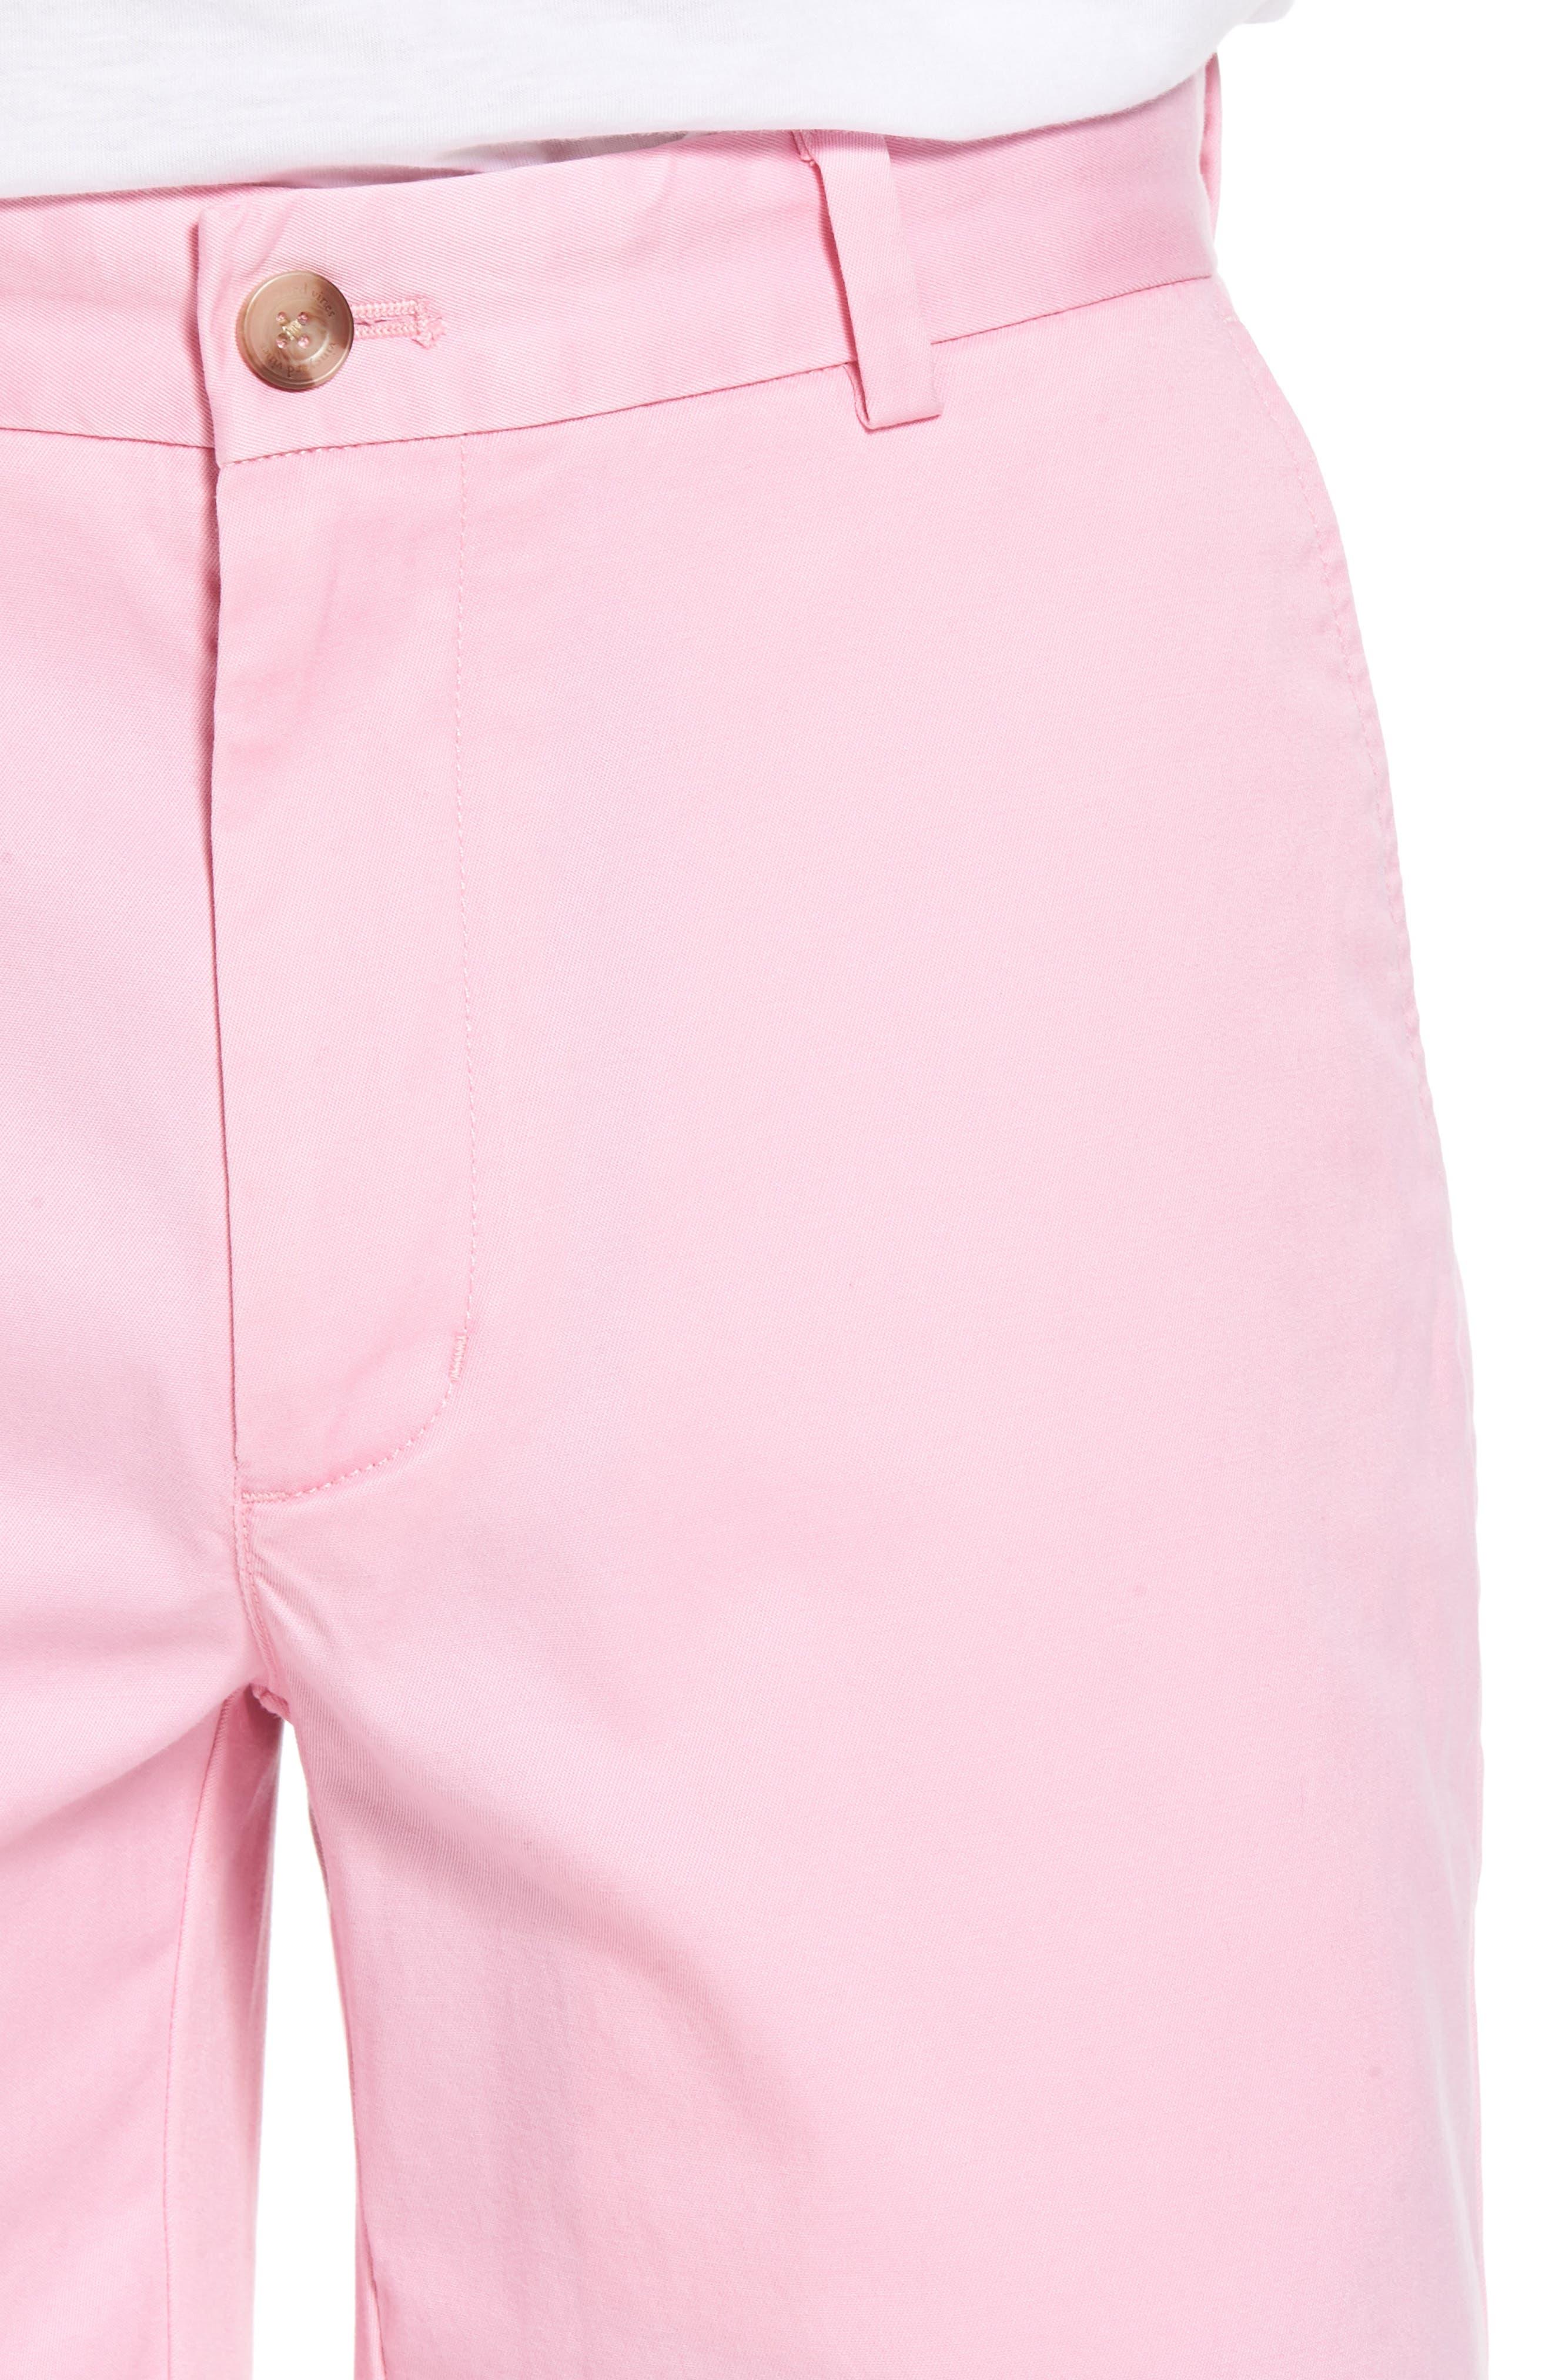 9 Inch Stretch Breaker Shorts,                             Alternate thumbnail 76, color,